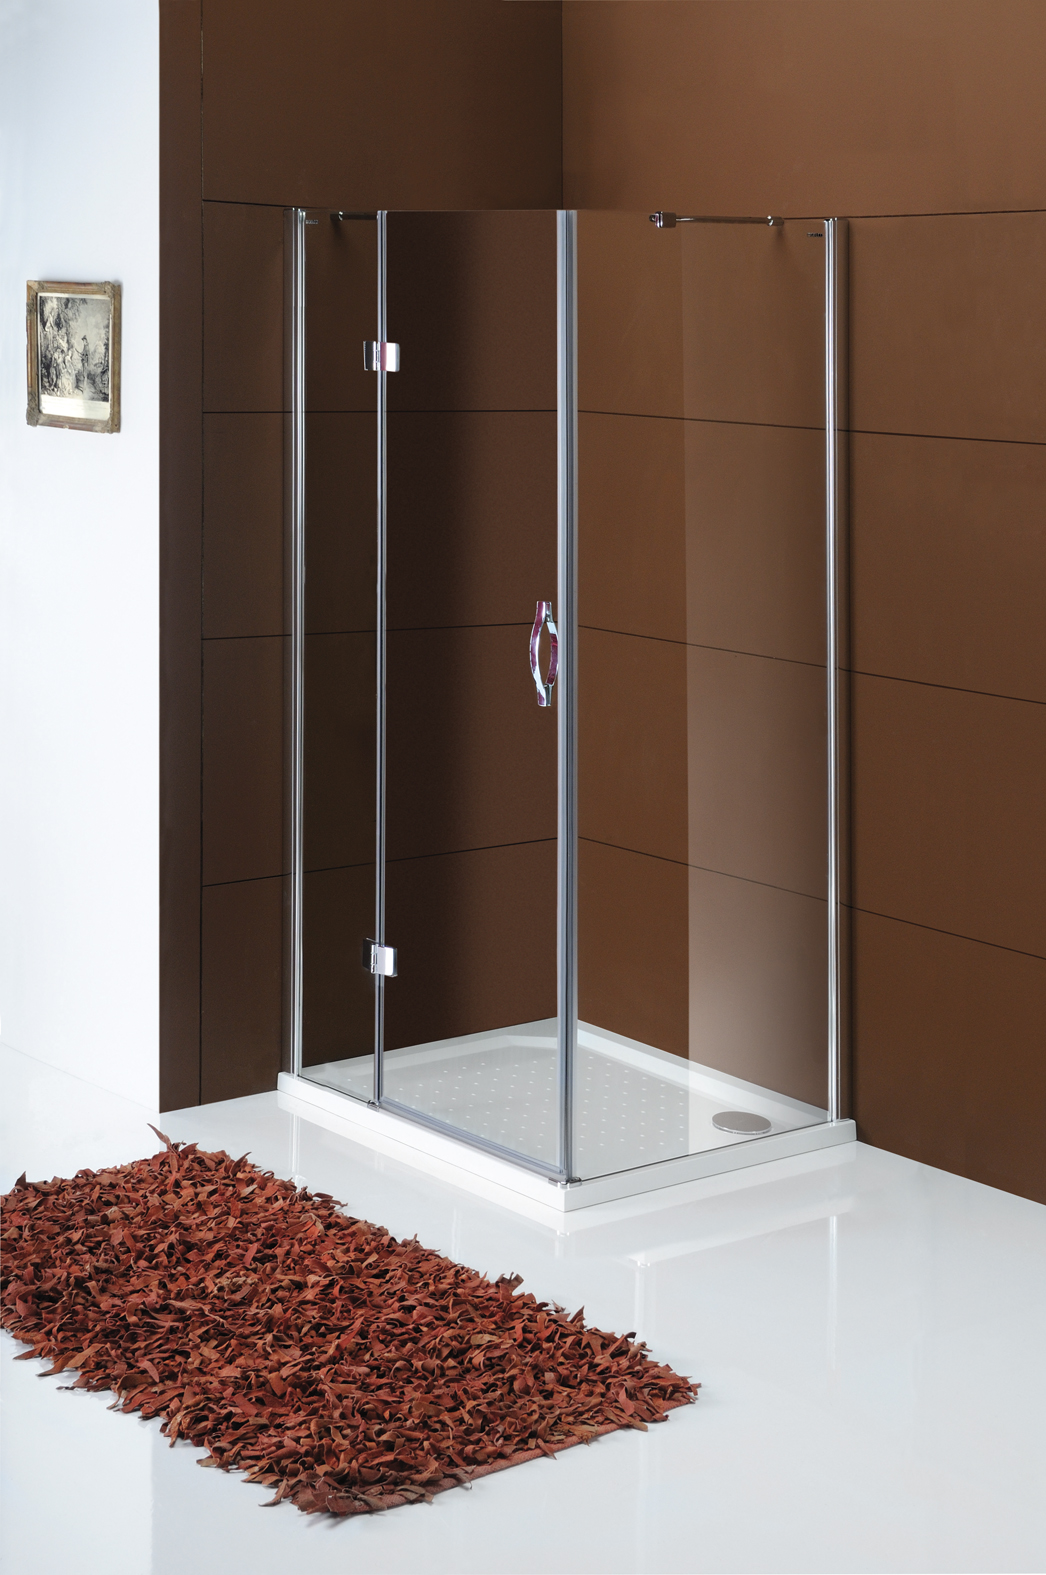 Gelco Sprchové dveře Legro jednodílné otočné 100 cm, sklo čiré/leštěný GL1110